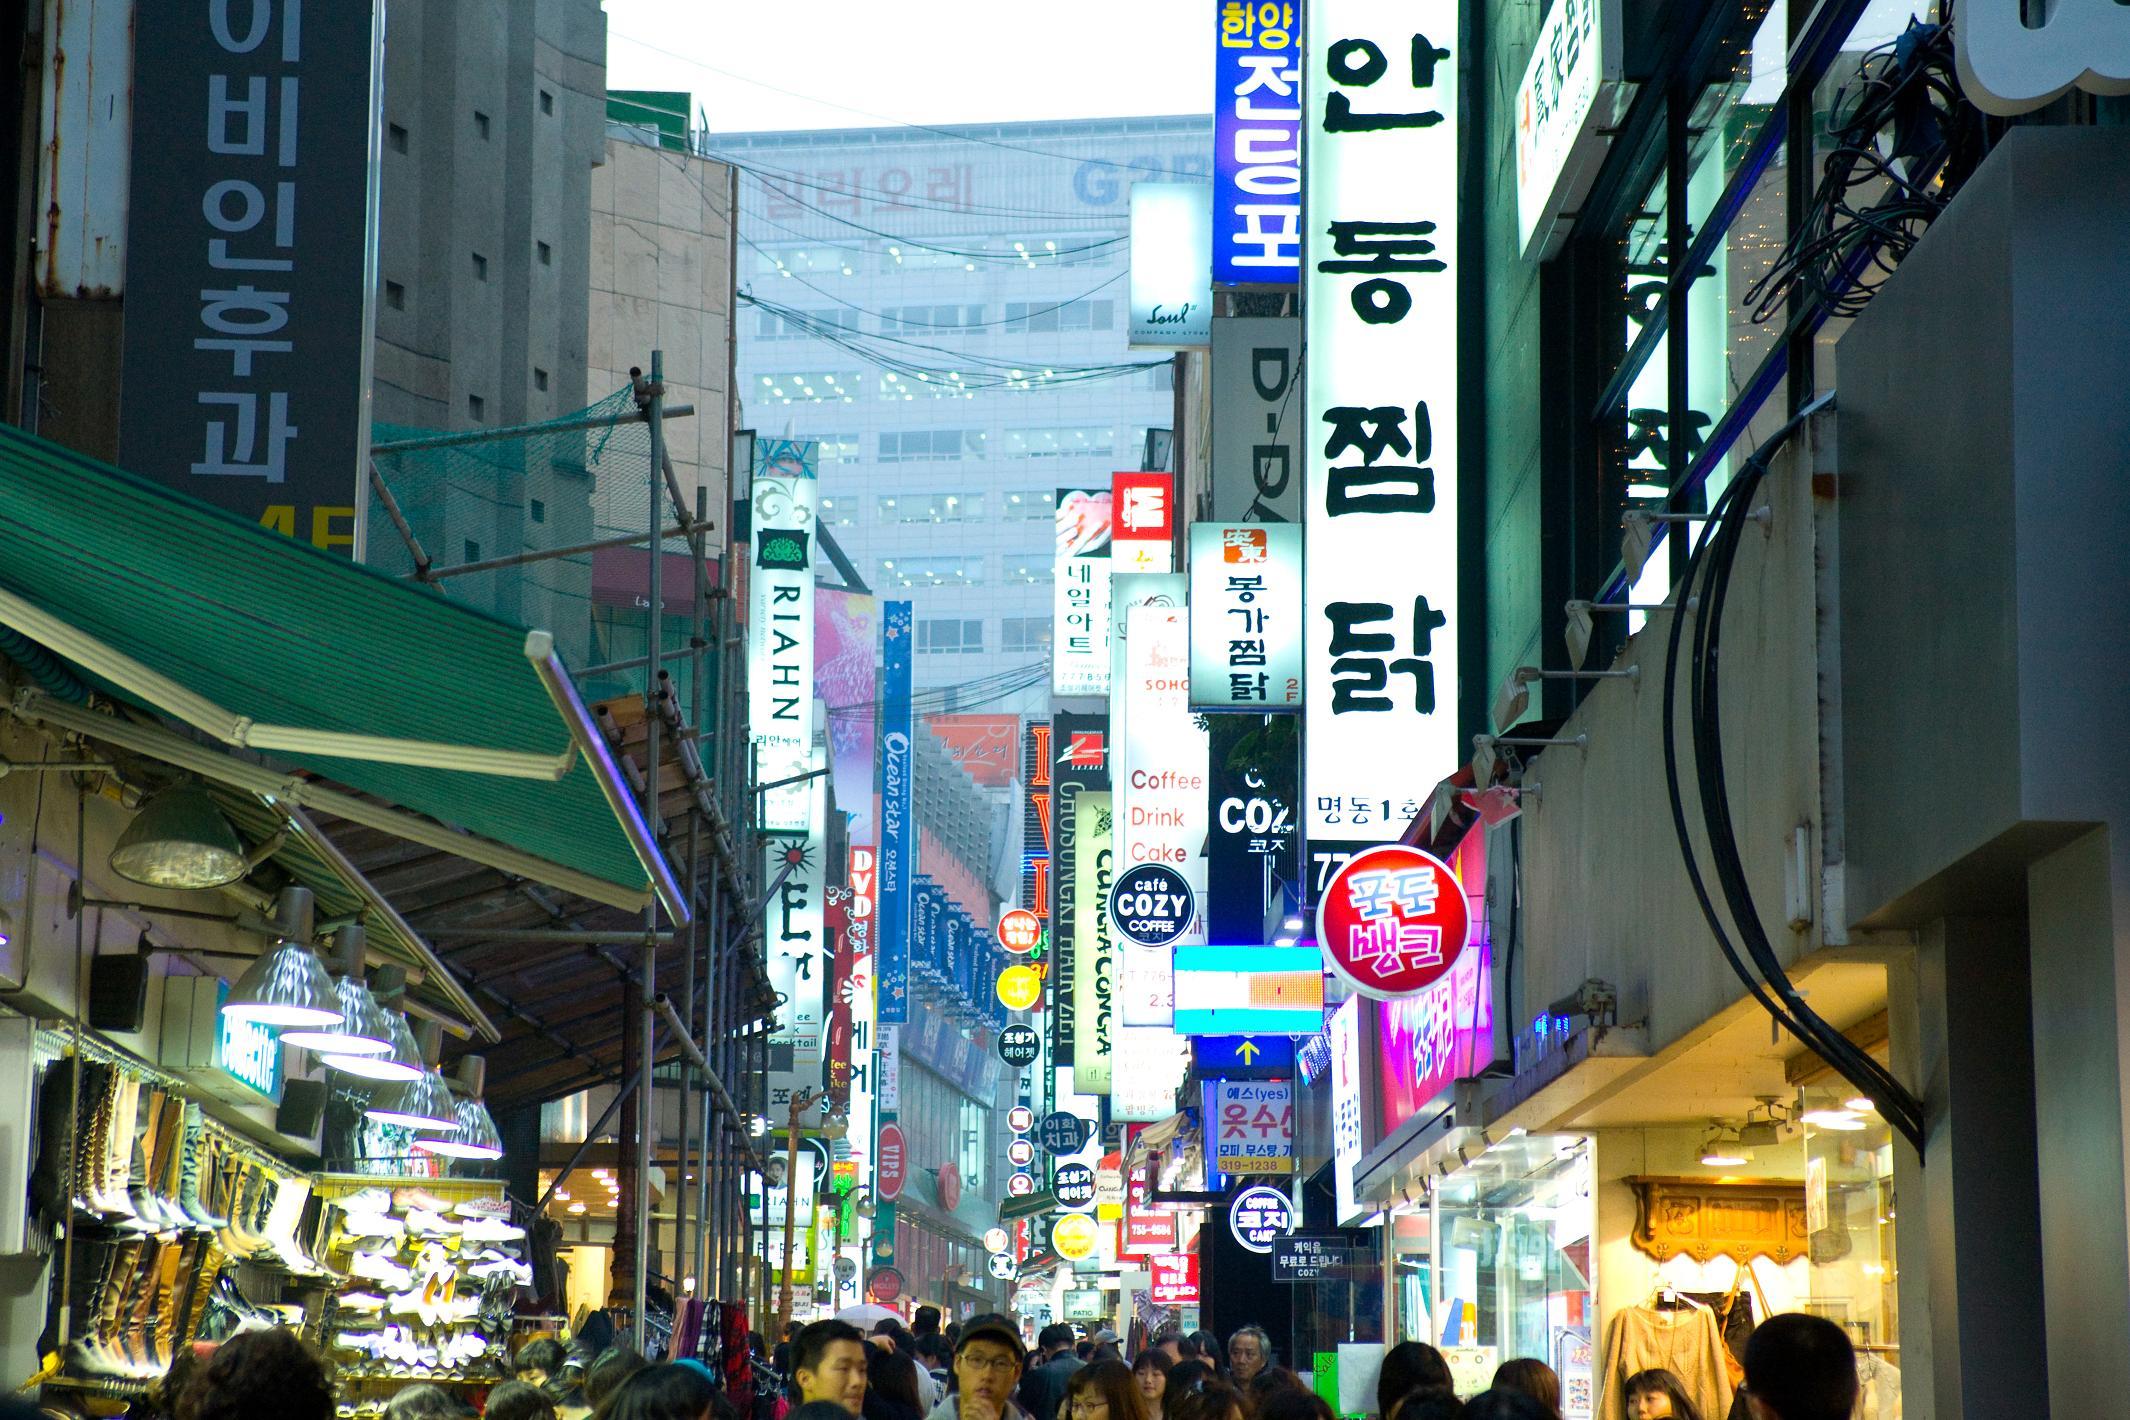 img 5a28d3c5285a3.png - 旅行前に調べておきたい「韓国の現状」の知識